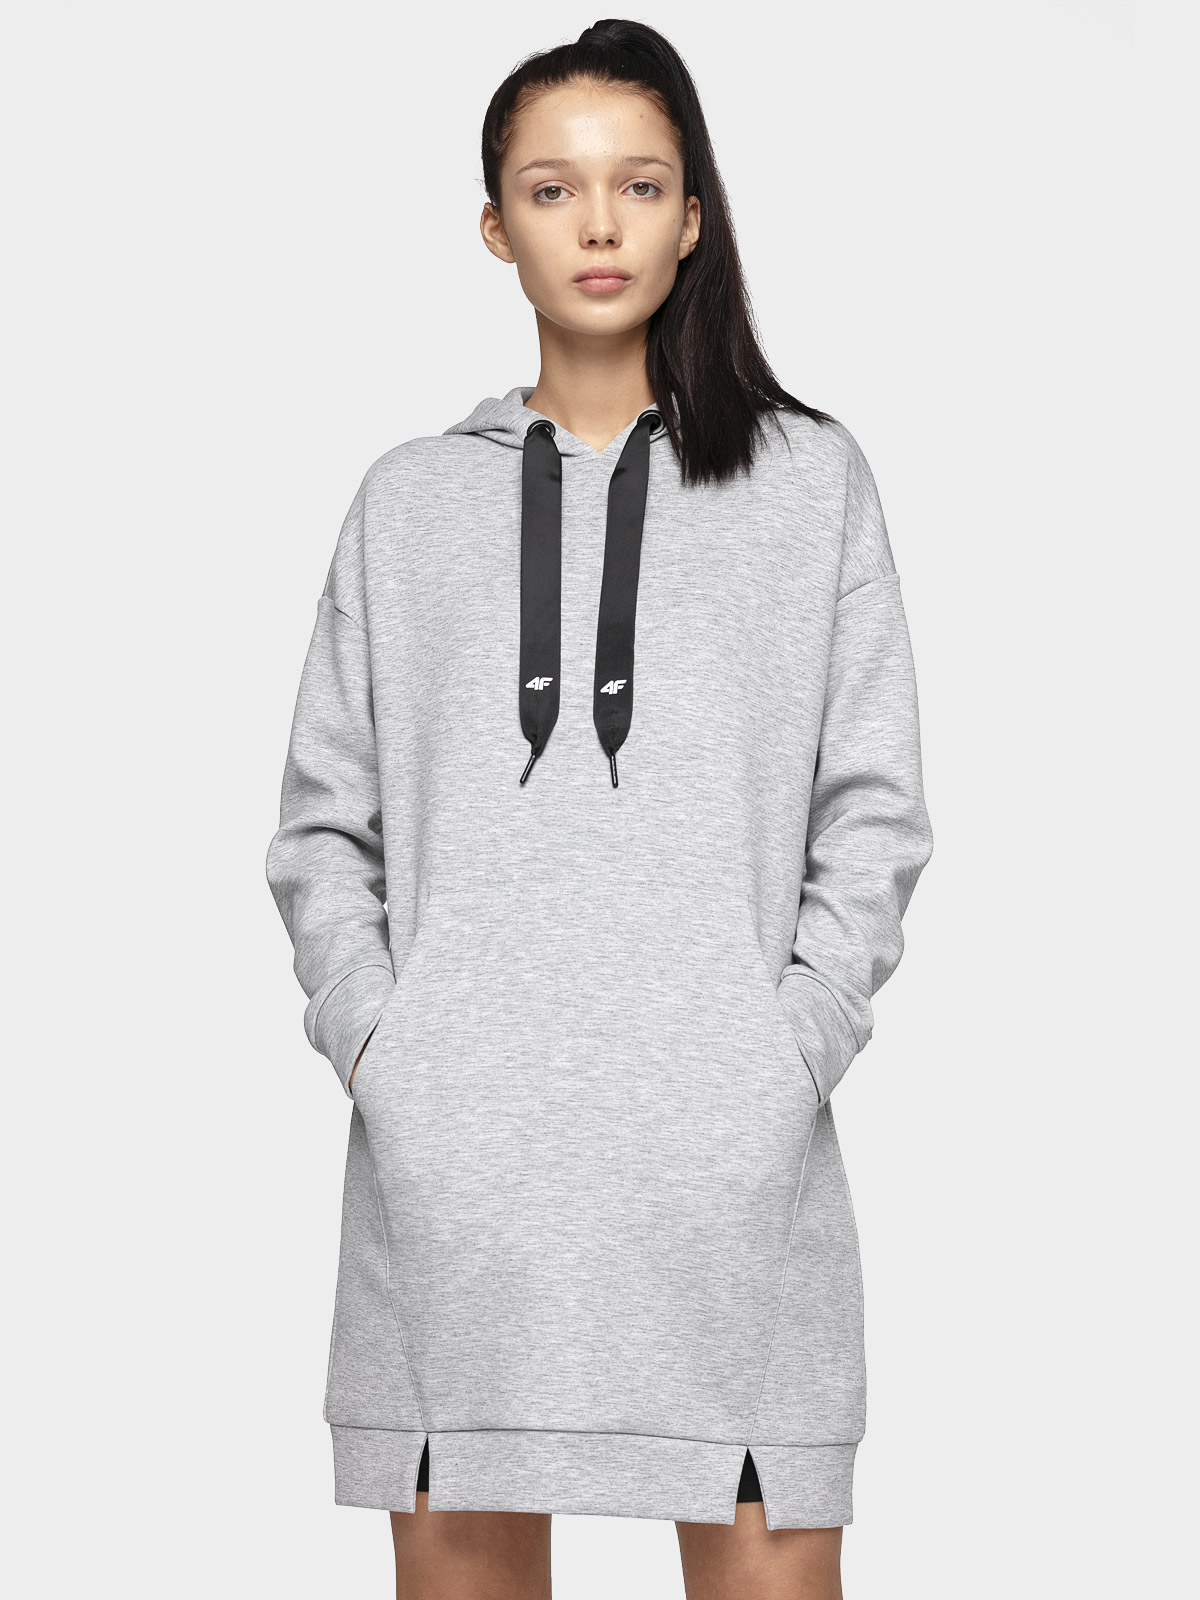 Bluza damska BLD006 - chłodny jasny szary melanż